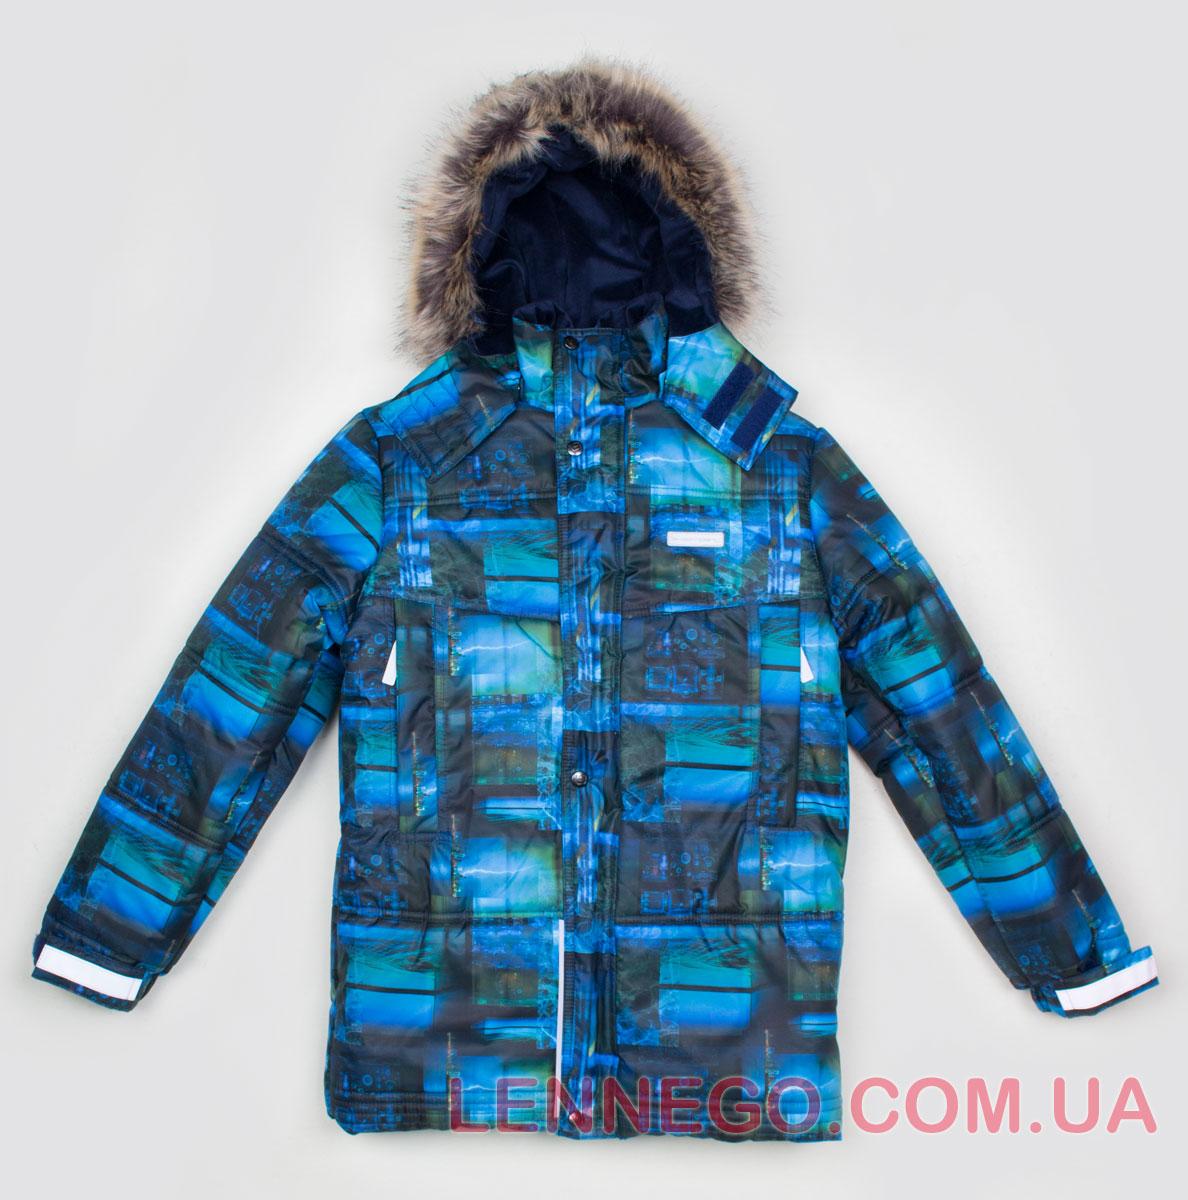 Lenne Sonny куртка для мальчика, подросток